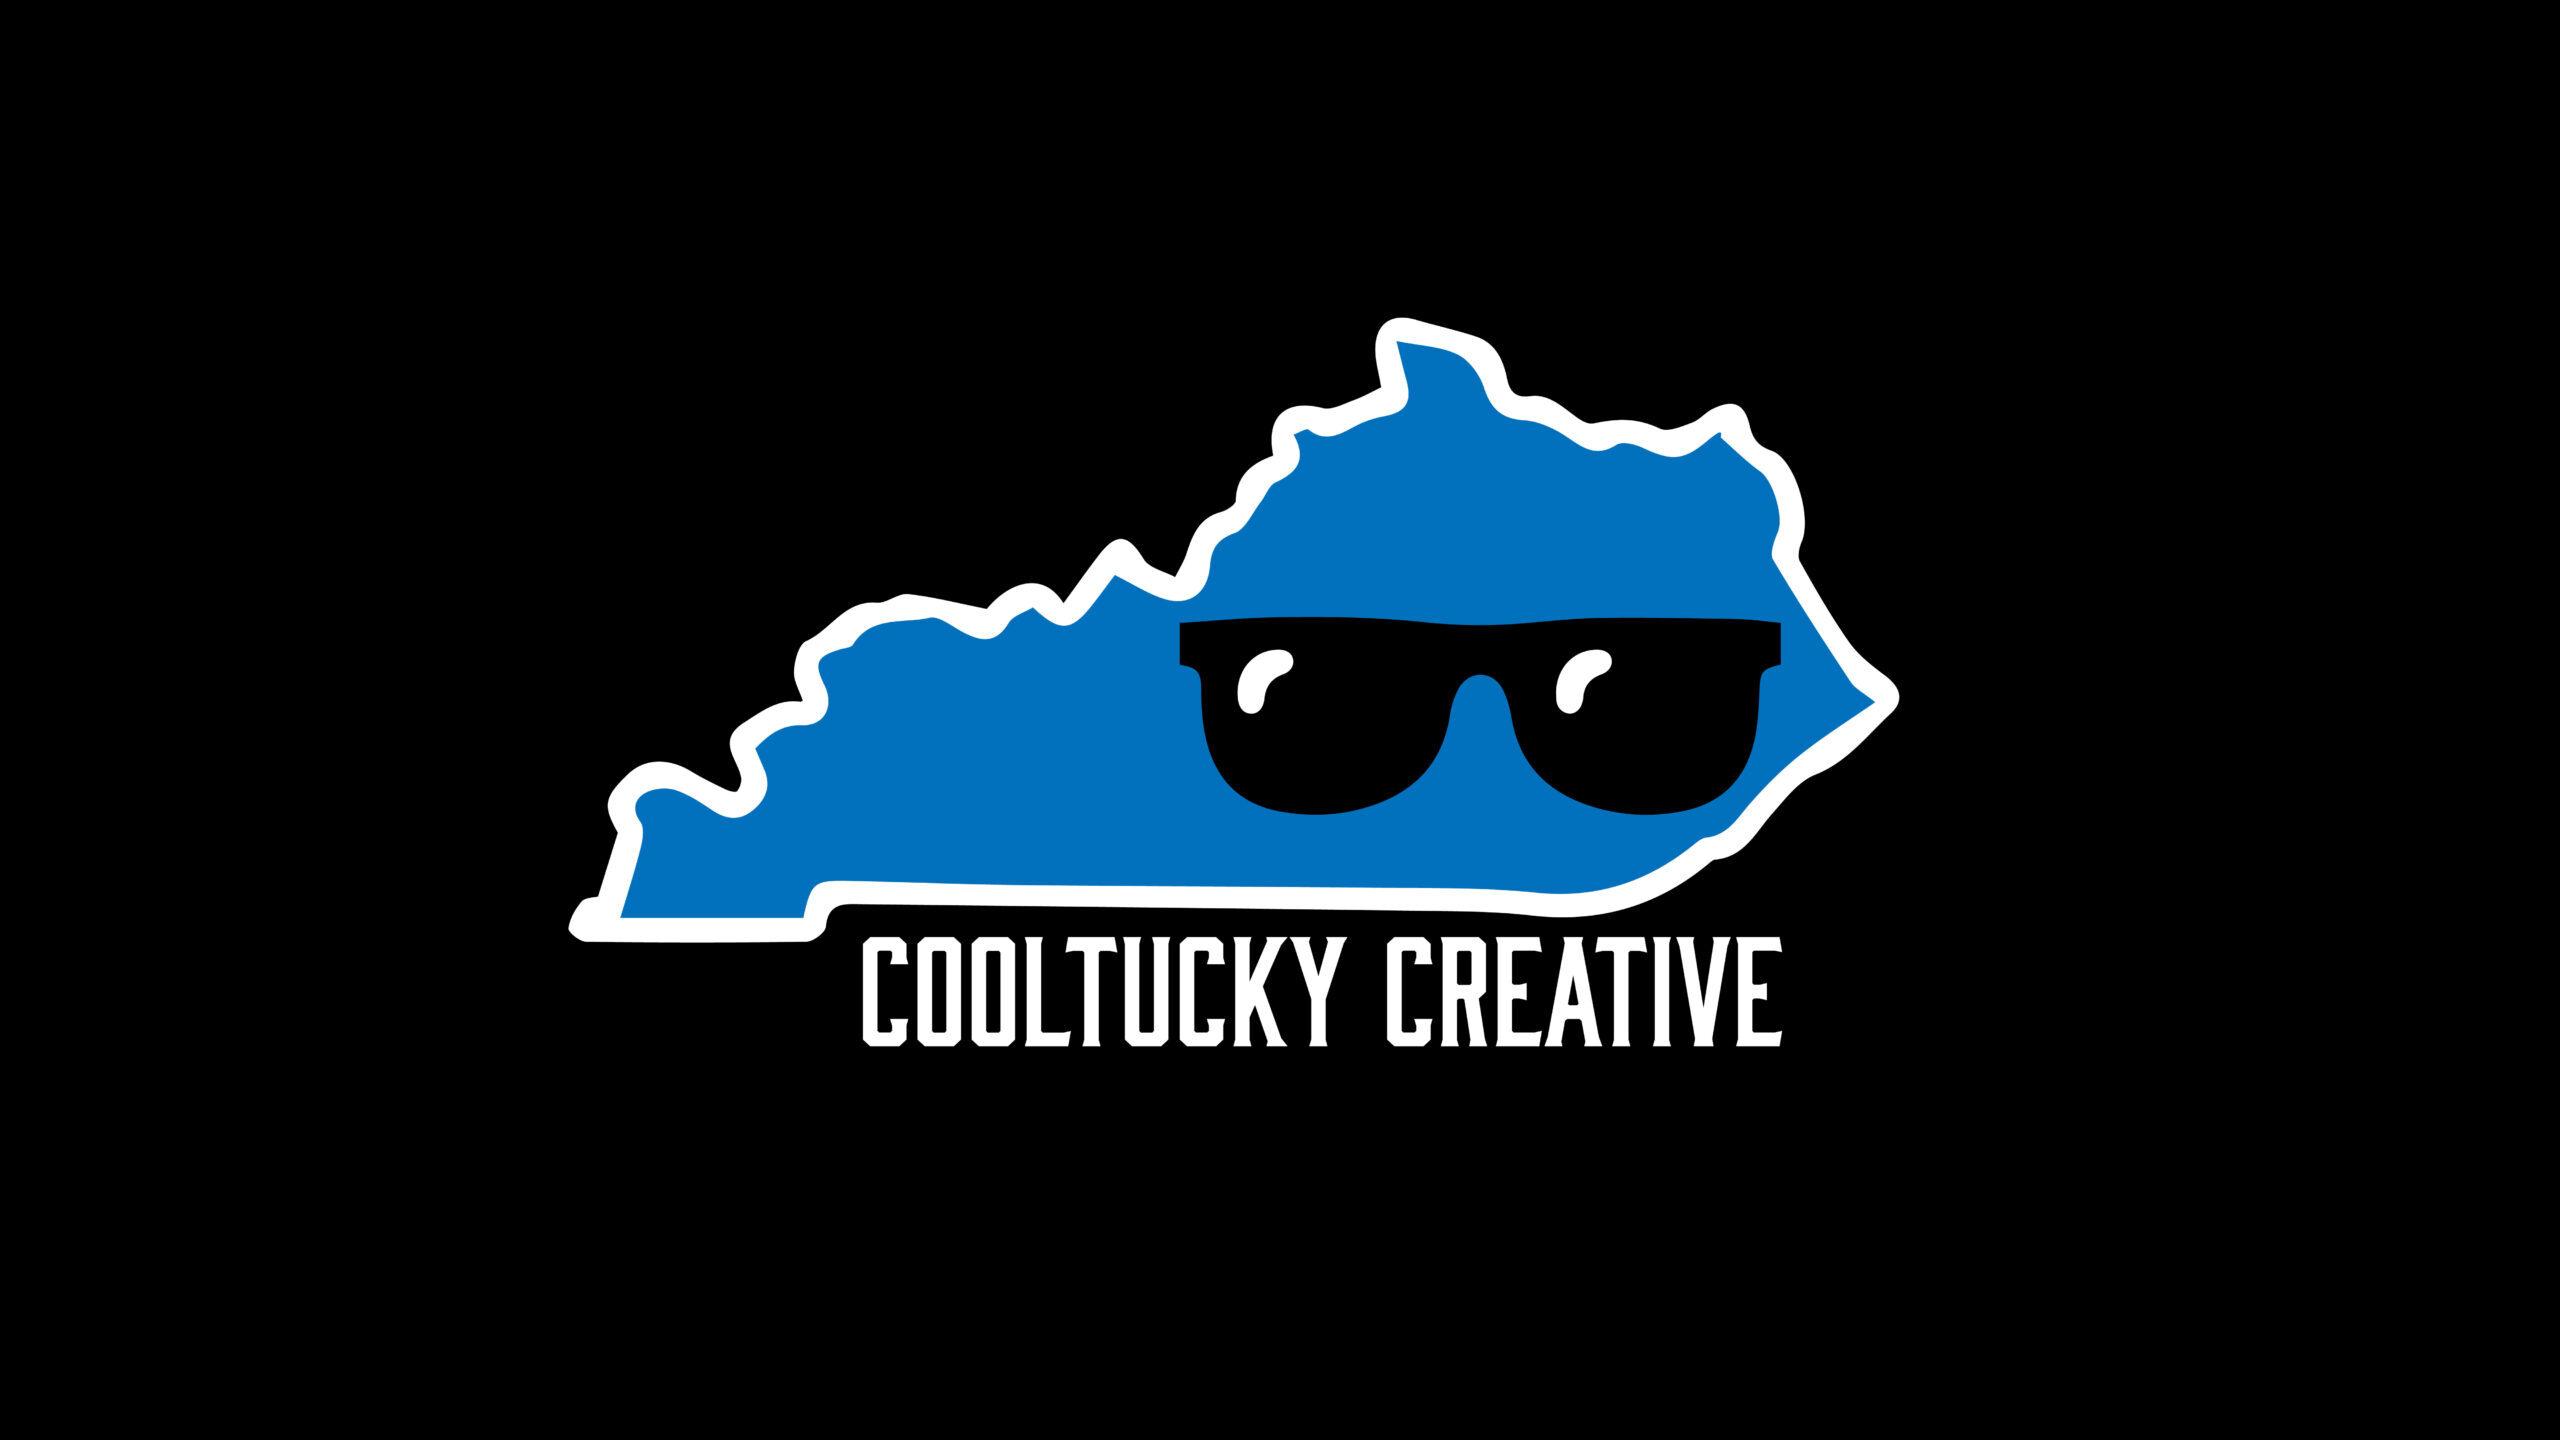 Cooltucky Creative